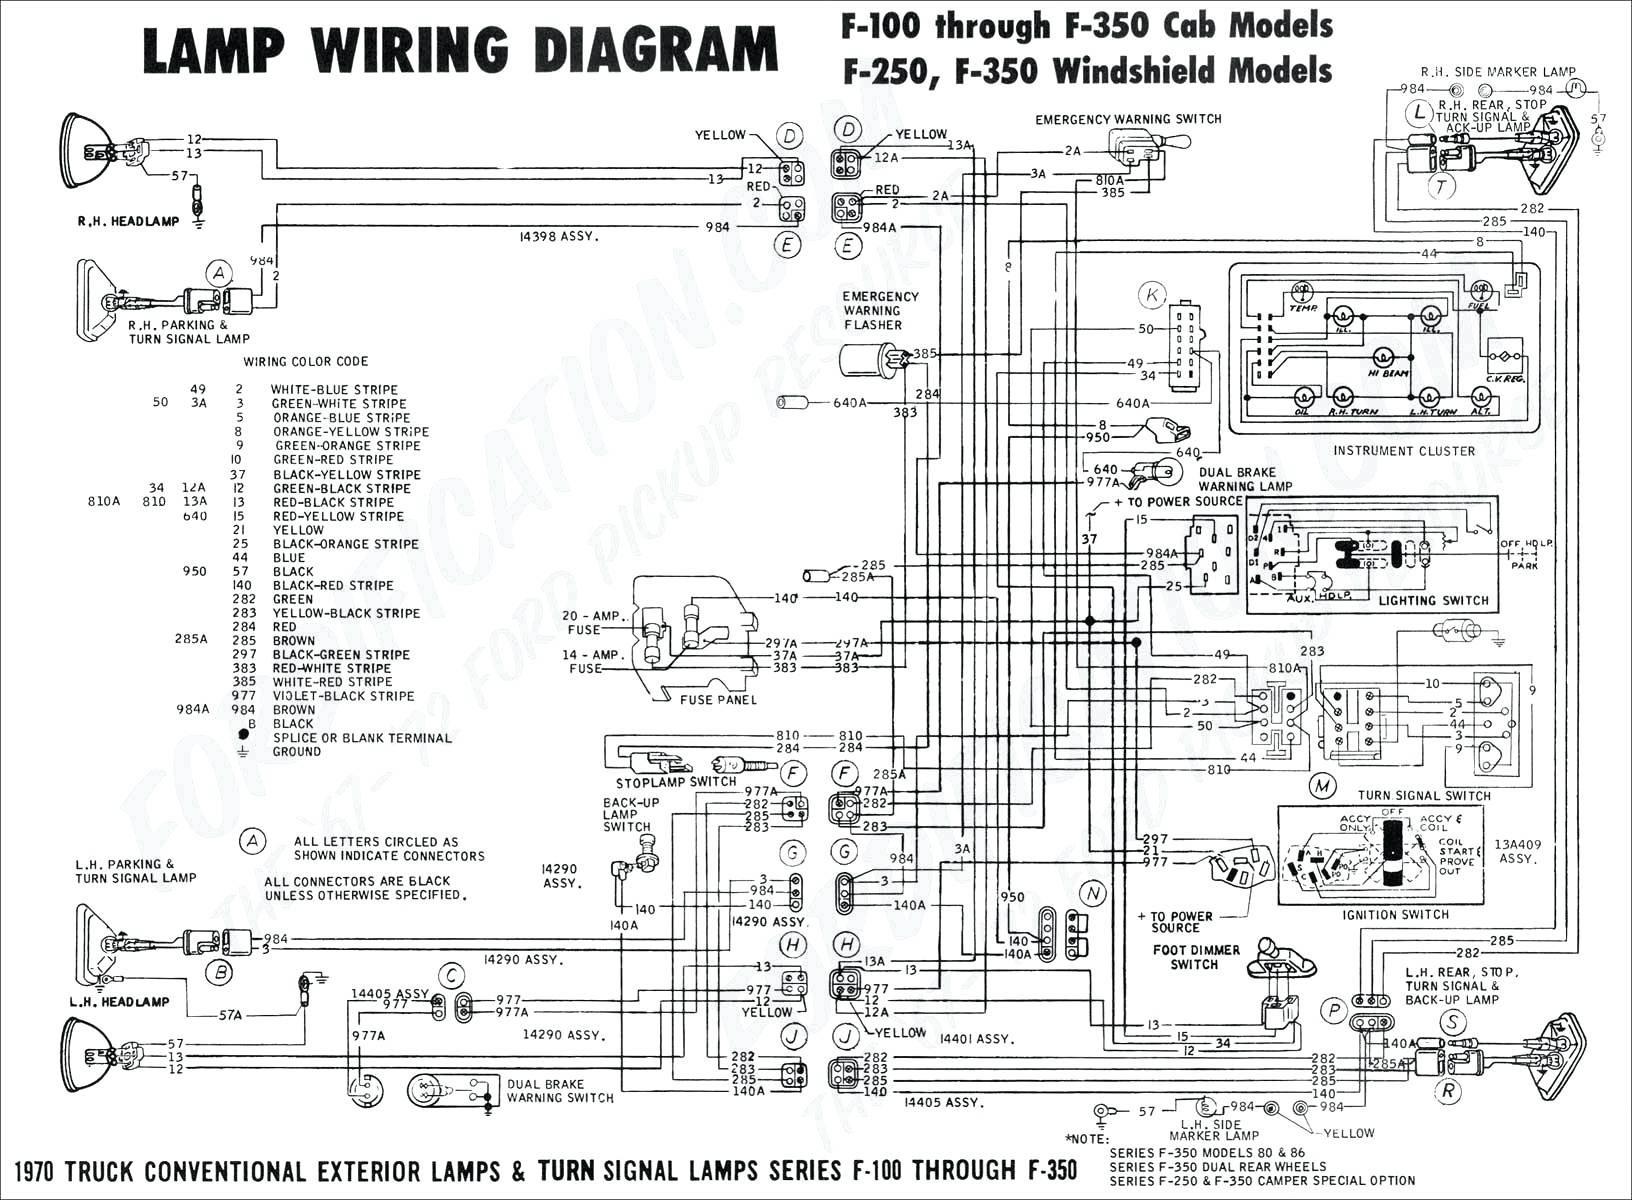 EY_3230] 2005 Ford F 150 Wiring Diagram Schematic WiringEumqu Capem Mohammedshrine Librar Wiring 101